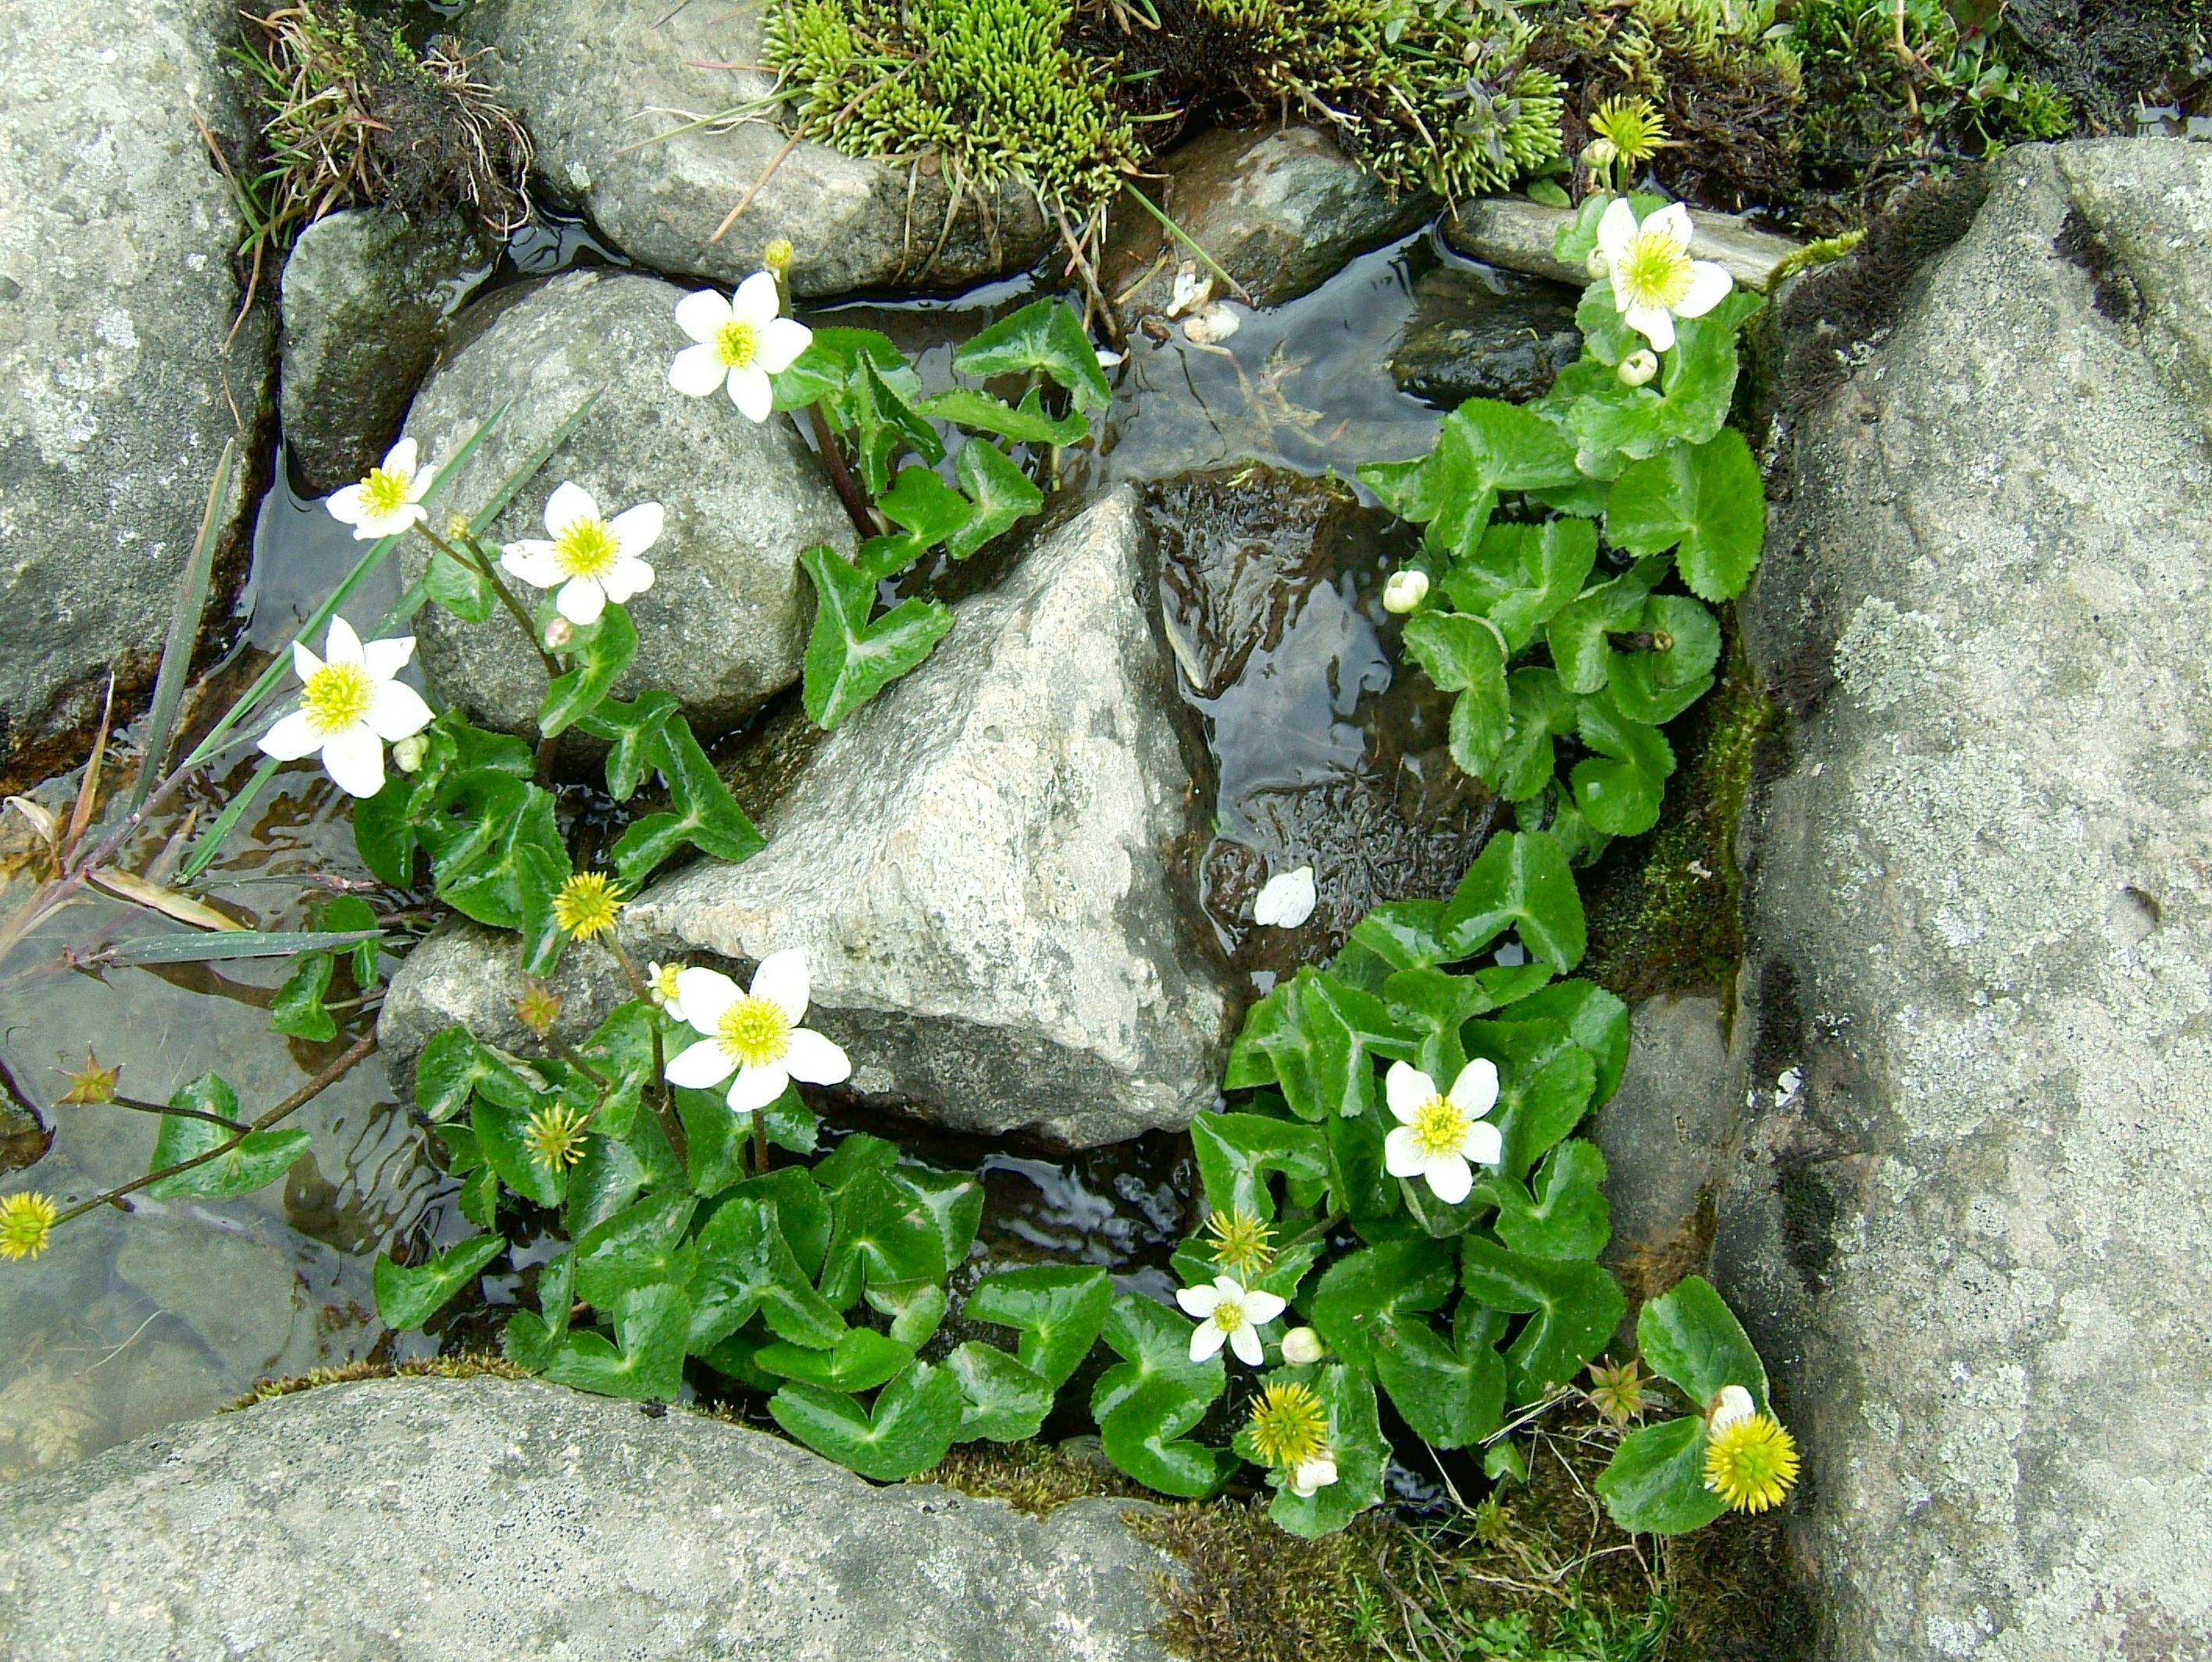 Local Wild spring flowers Srinagar Kashmir India 06